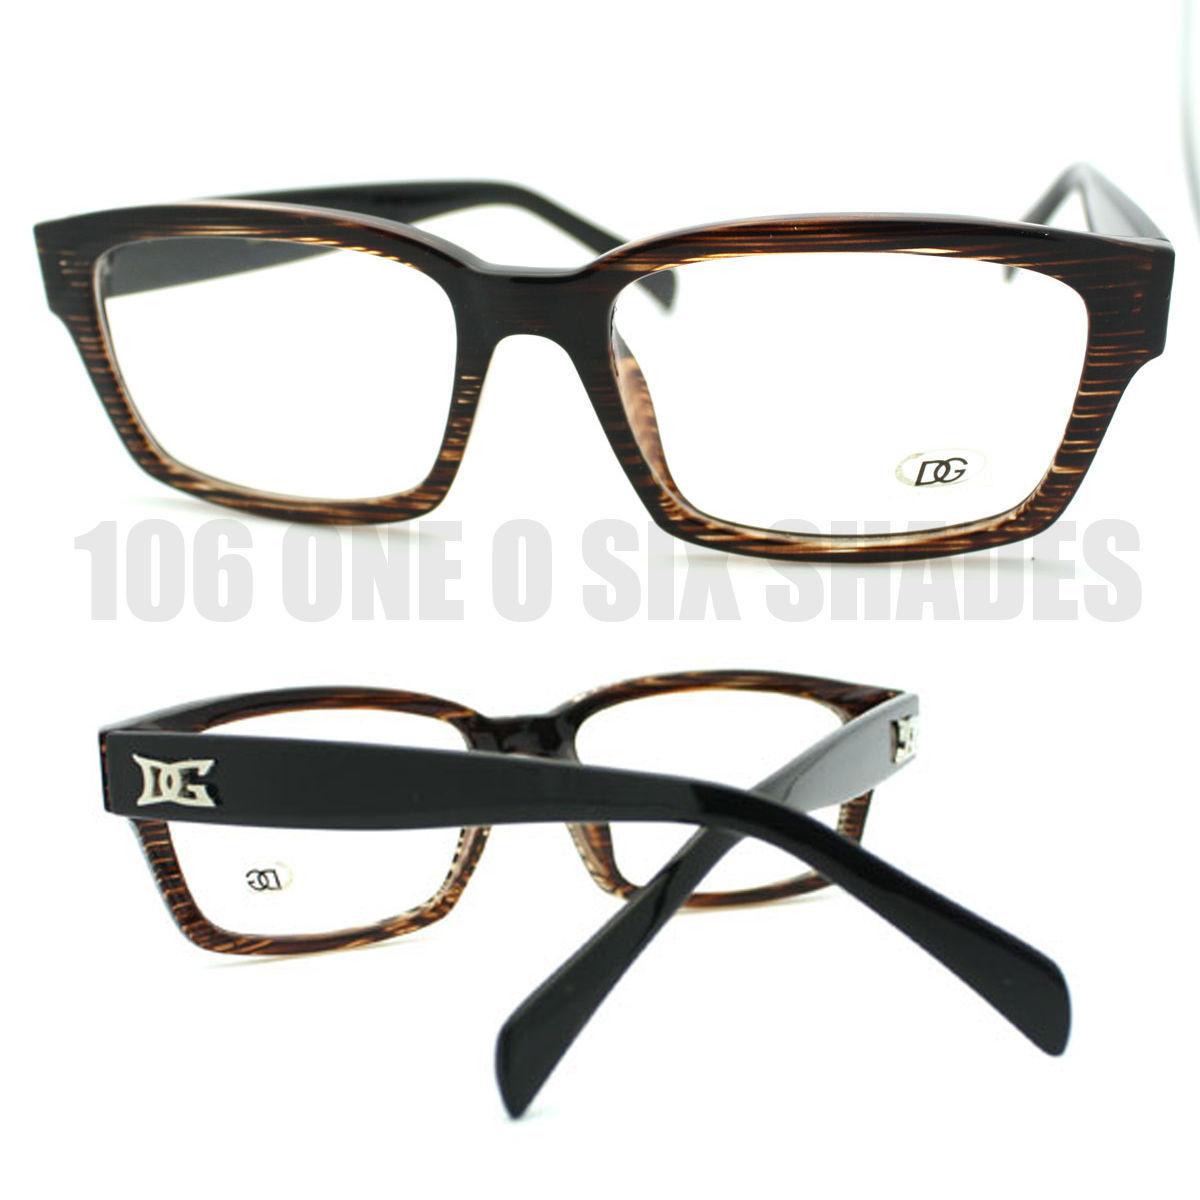 New 2-Tone Brown Hardcore Narrow Clear Lens Glasses ...